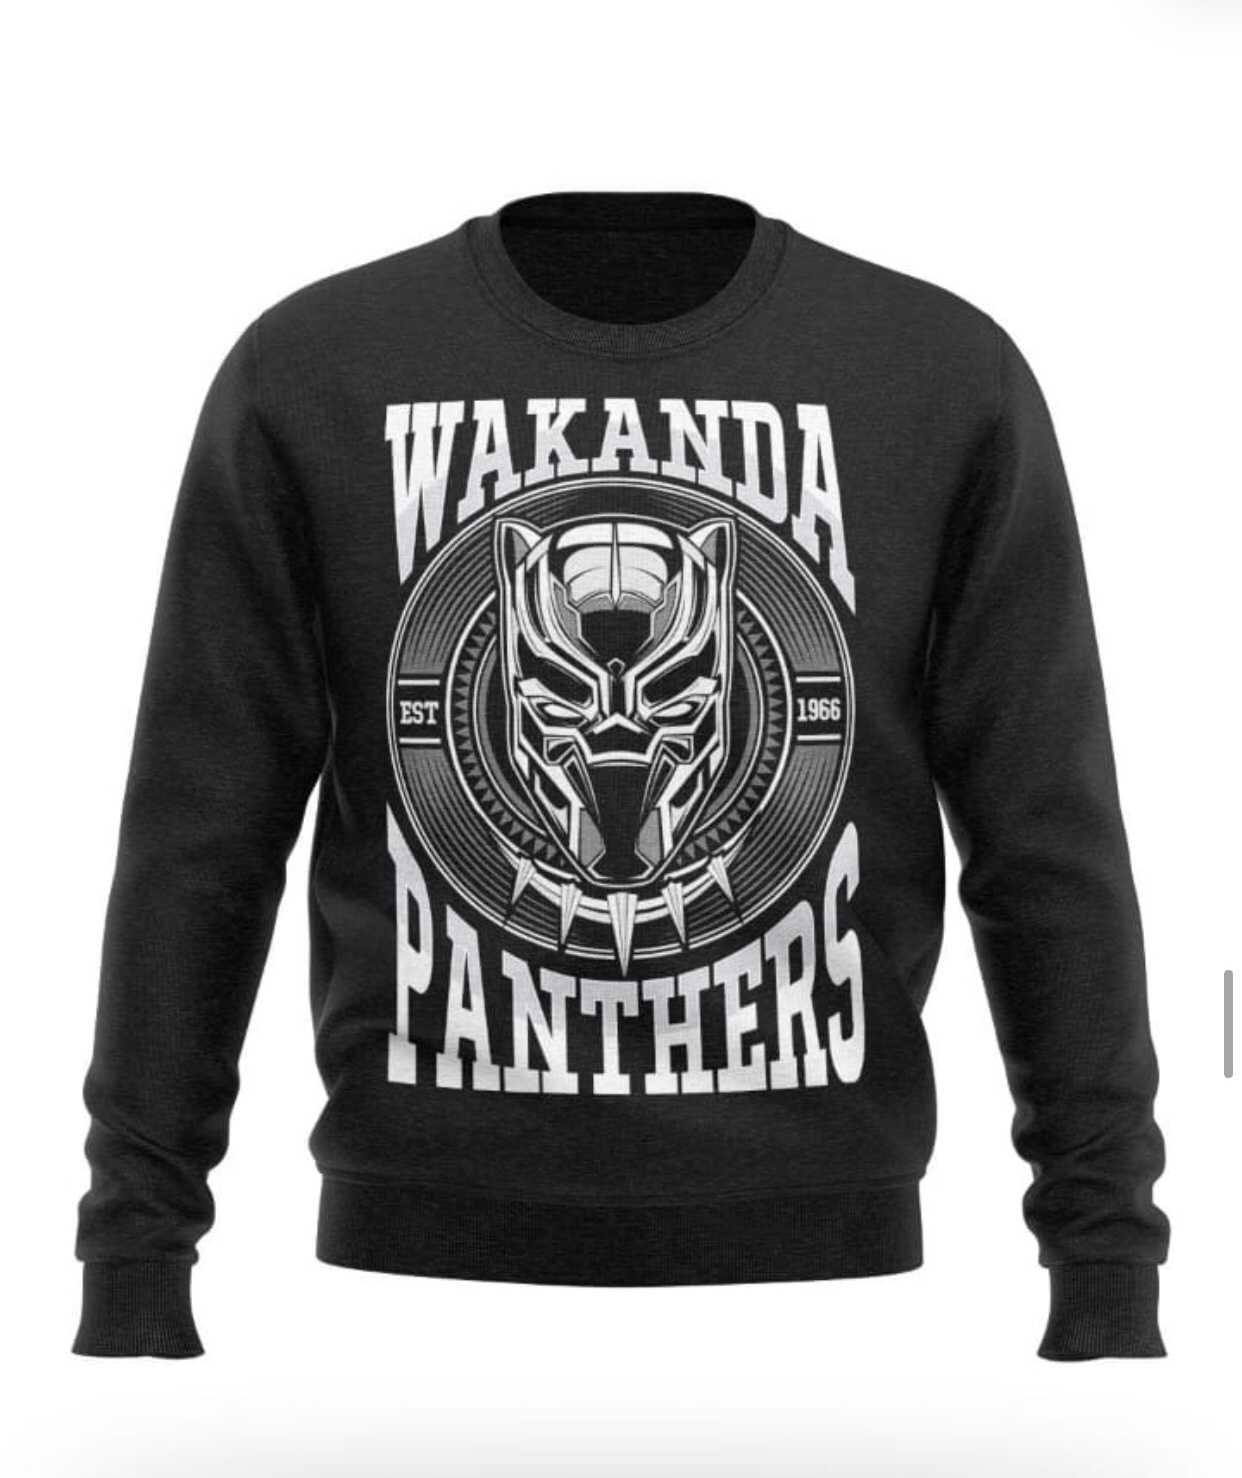 Blusa Pantera negra 3